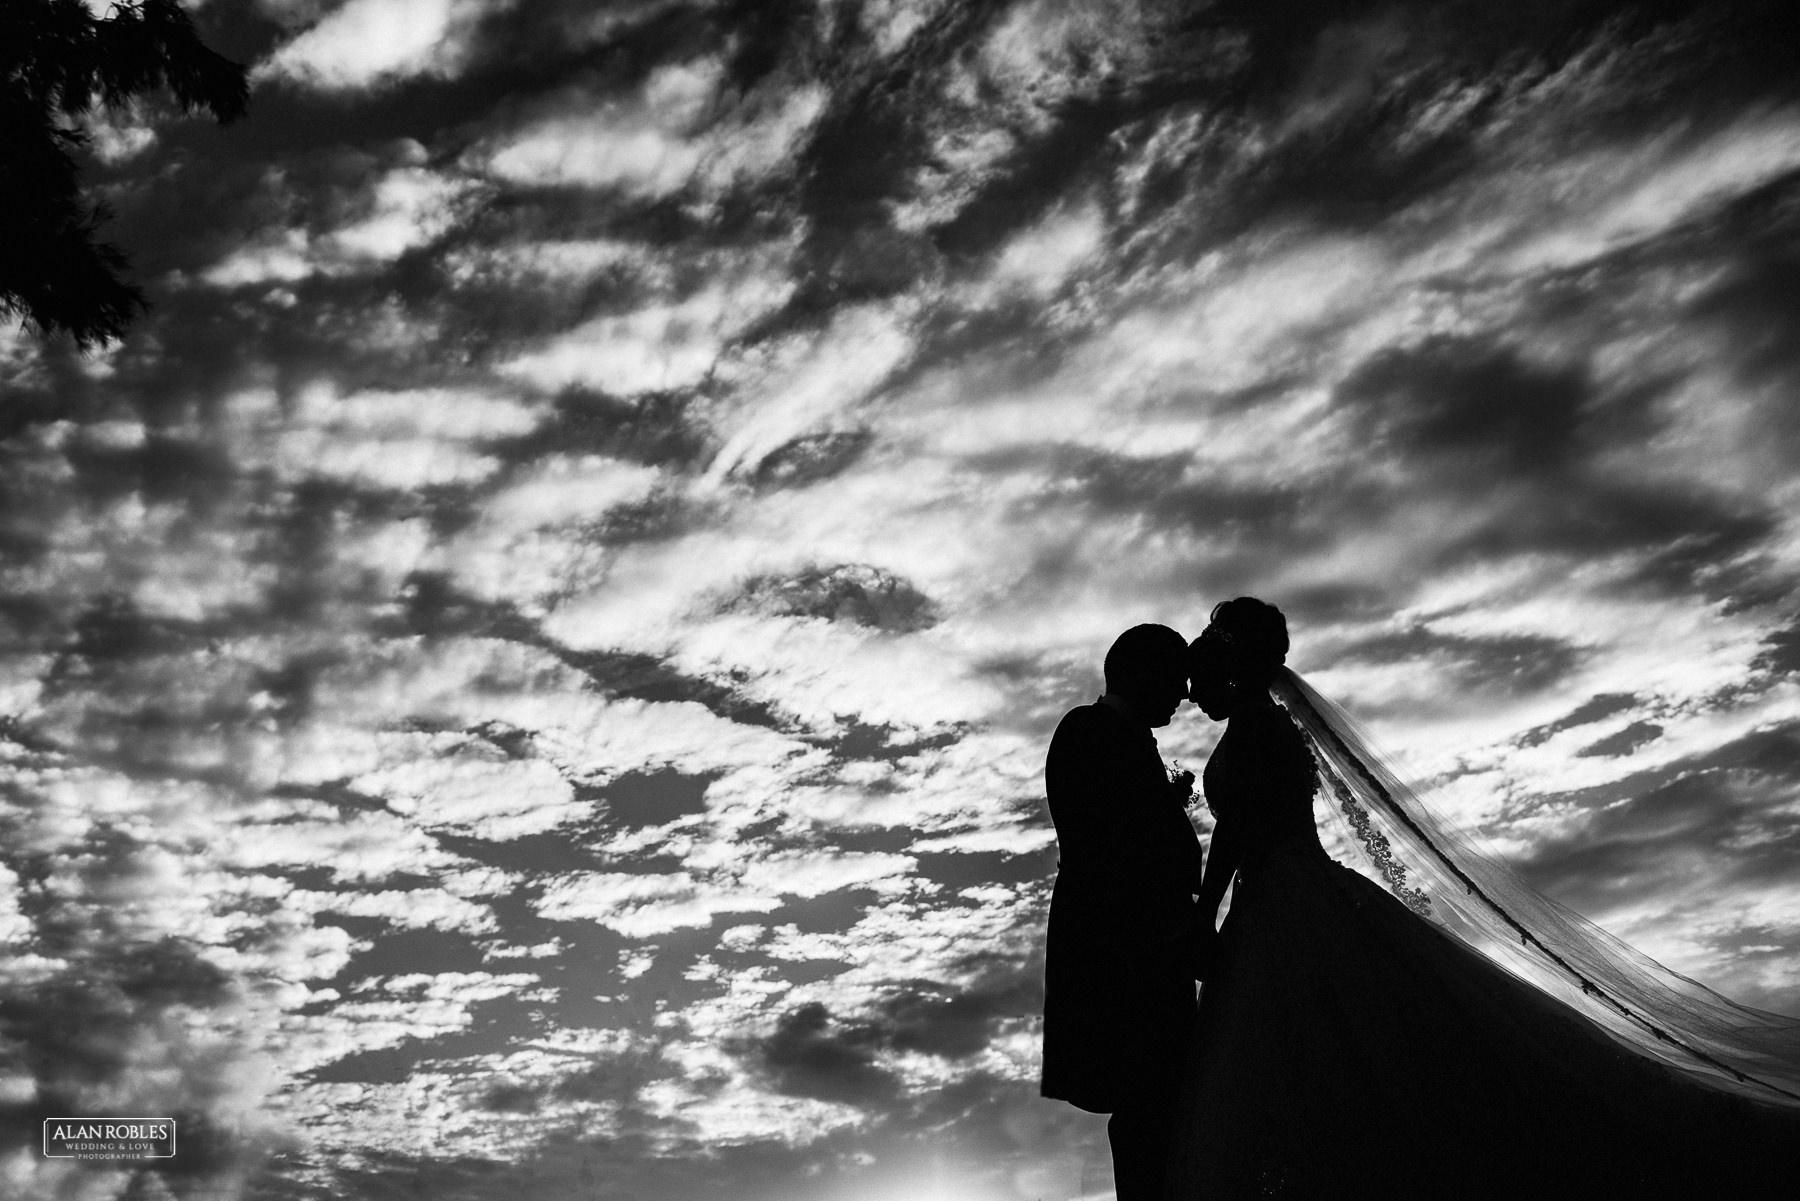 Alan Robles fotografo de bodas guadalajara - LyP Hotel Demetria-58